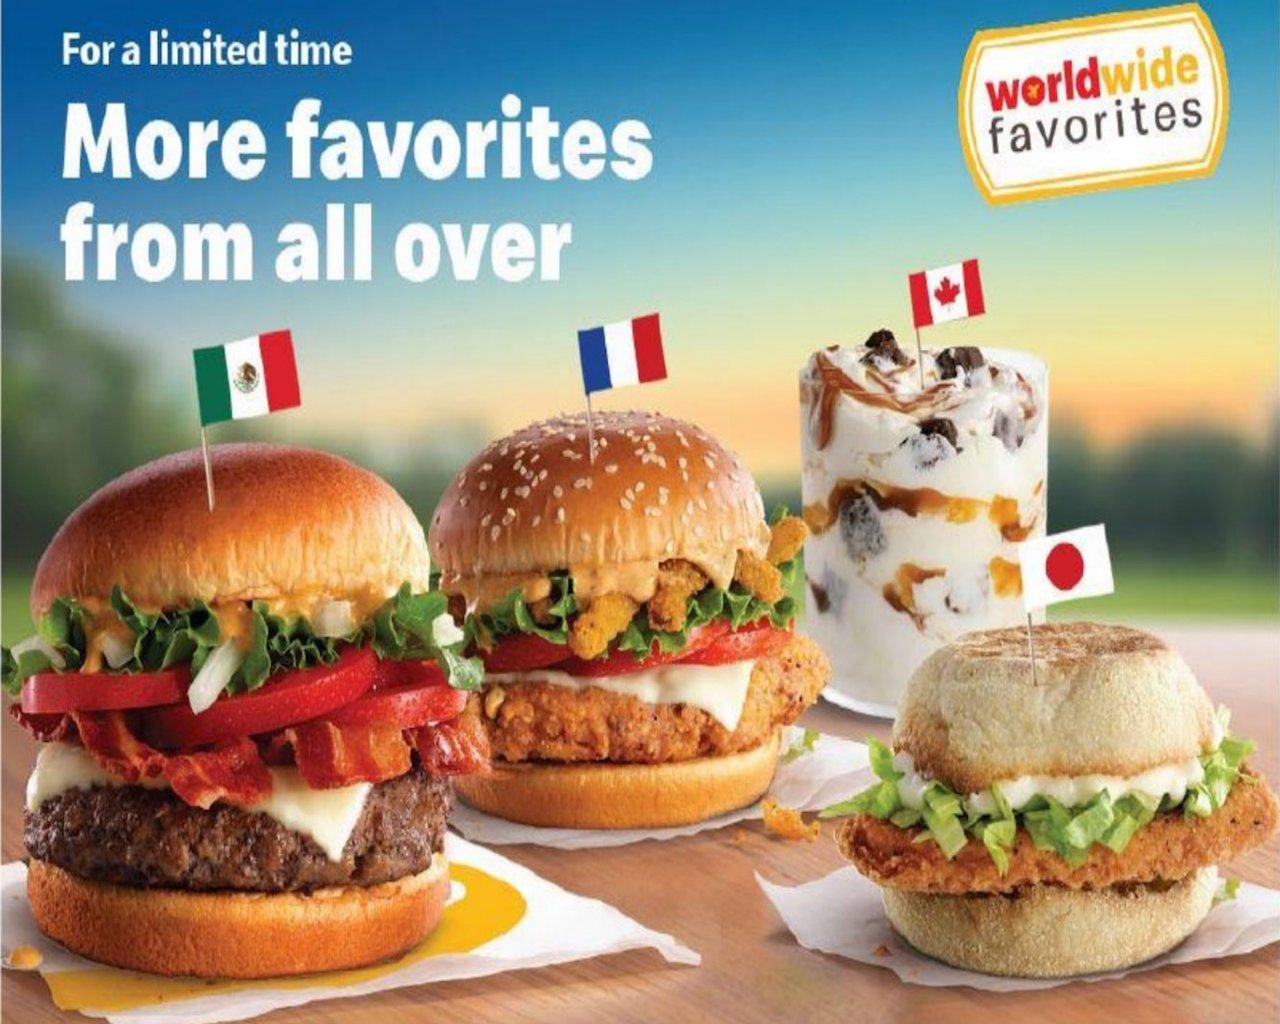 mcdonalds-international-favorites-2